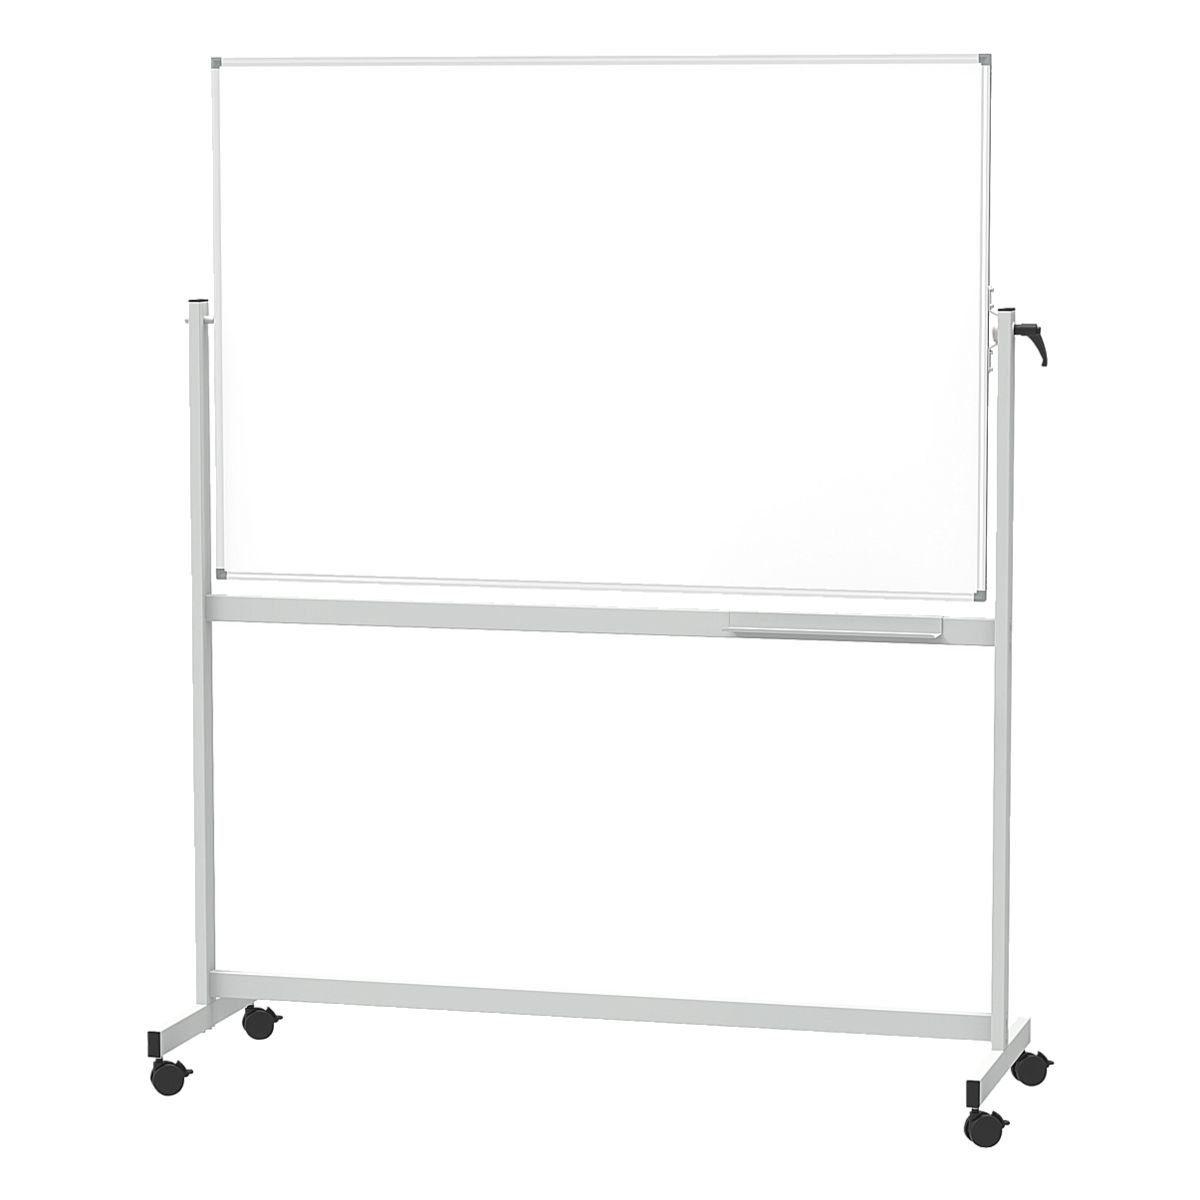 Maul Whiteboard kunststoffbeschichtet, 180 x 120 cm »Maul Standard 6459484«